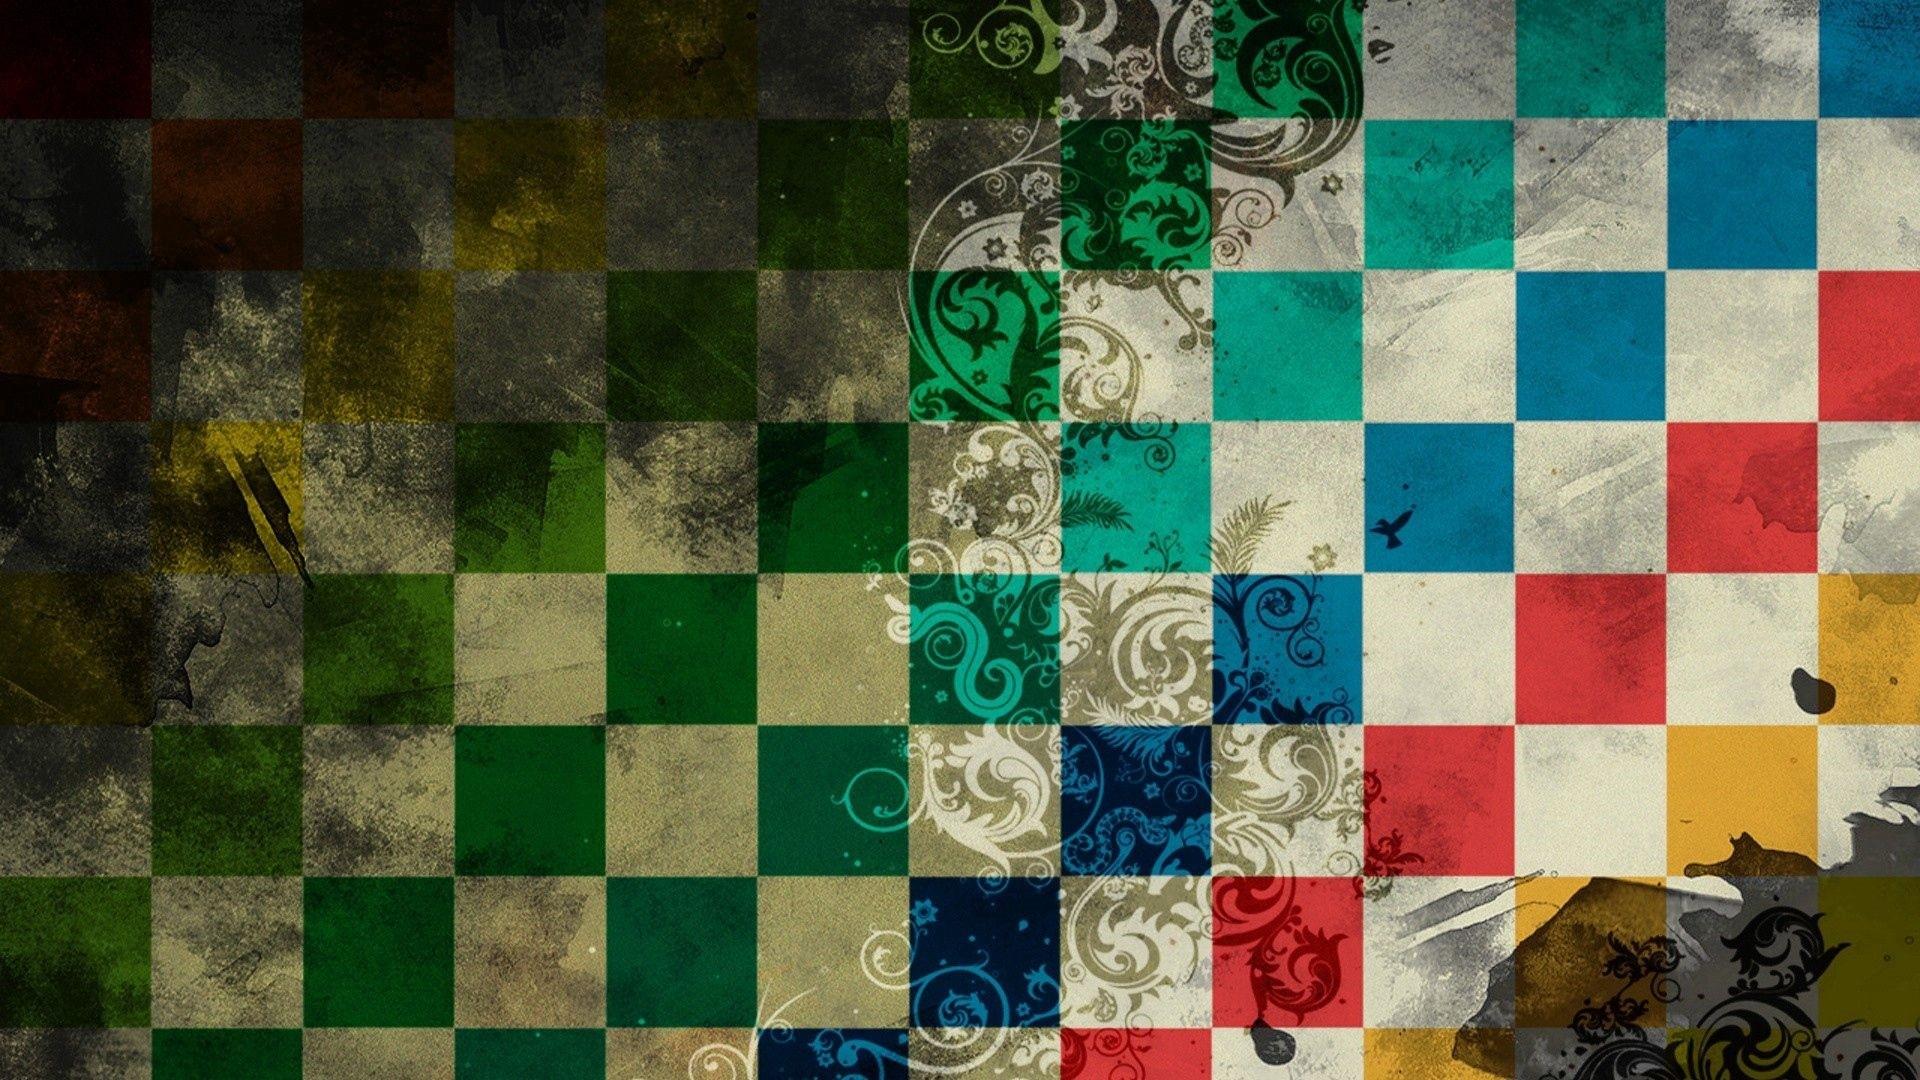 Checkered a wallpaper